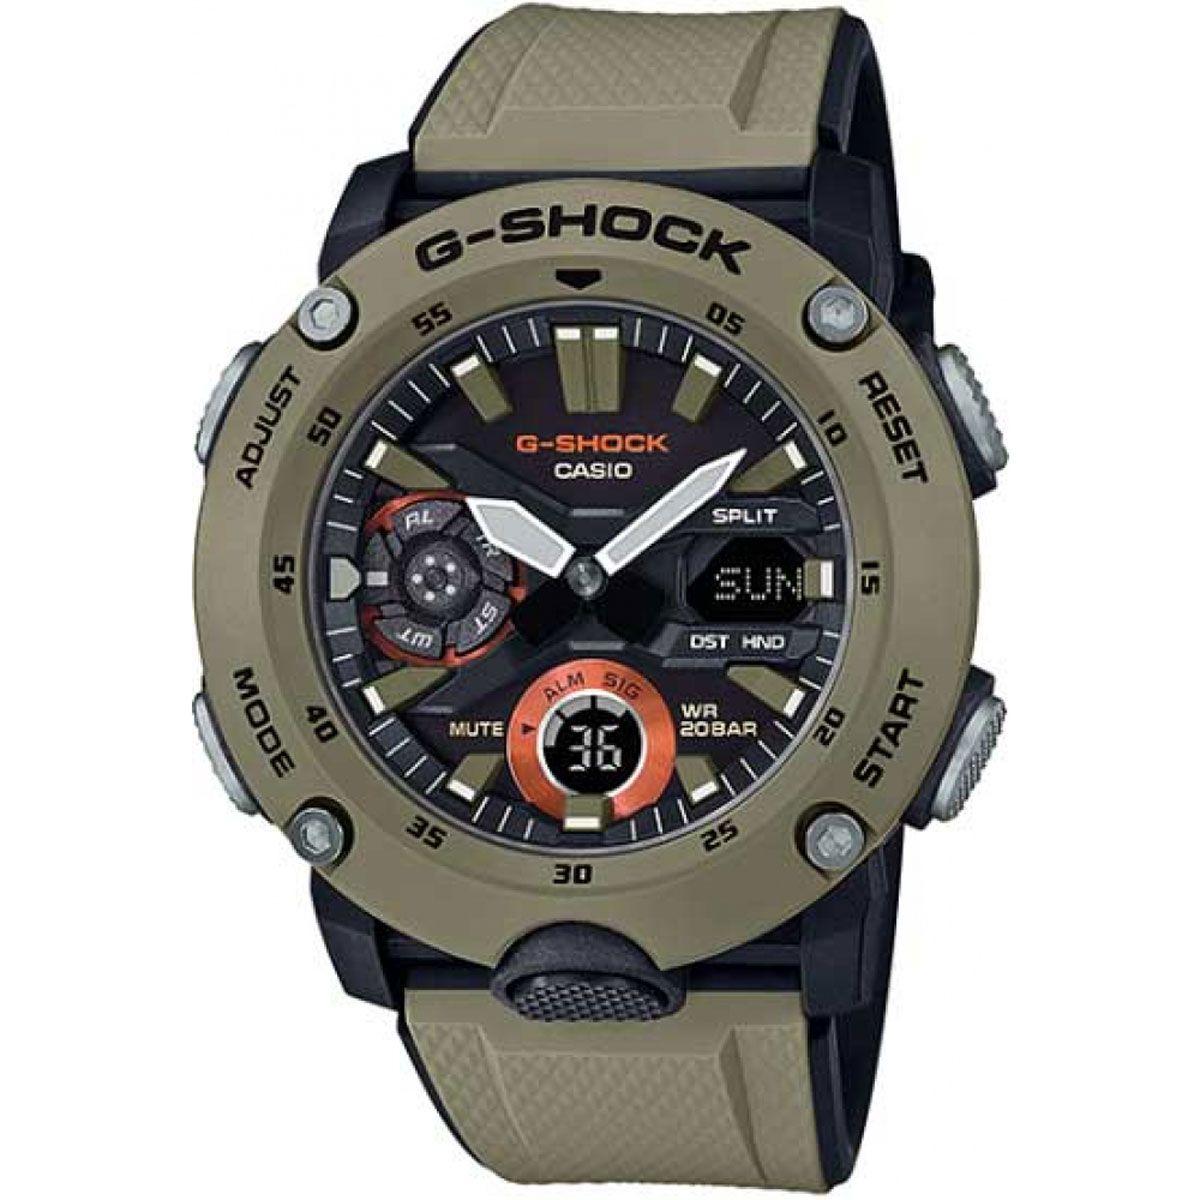 Relógio de Pulso Masculino Casio G-Shock GA-2000-5ADR - Caqui